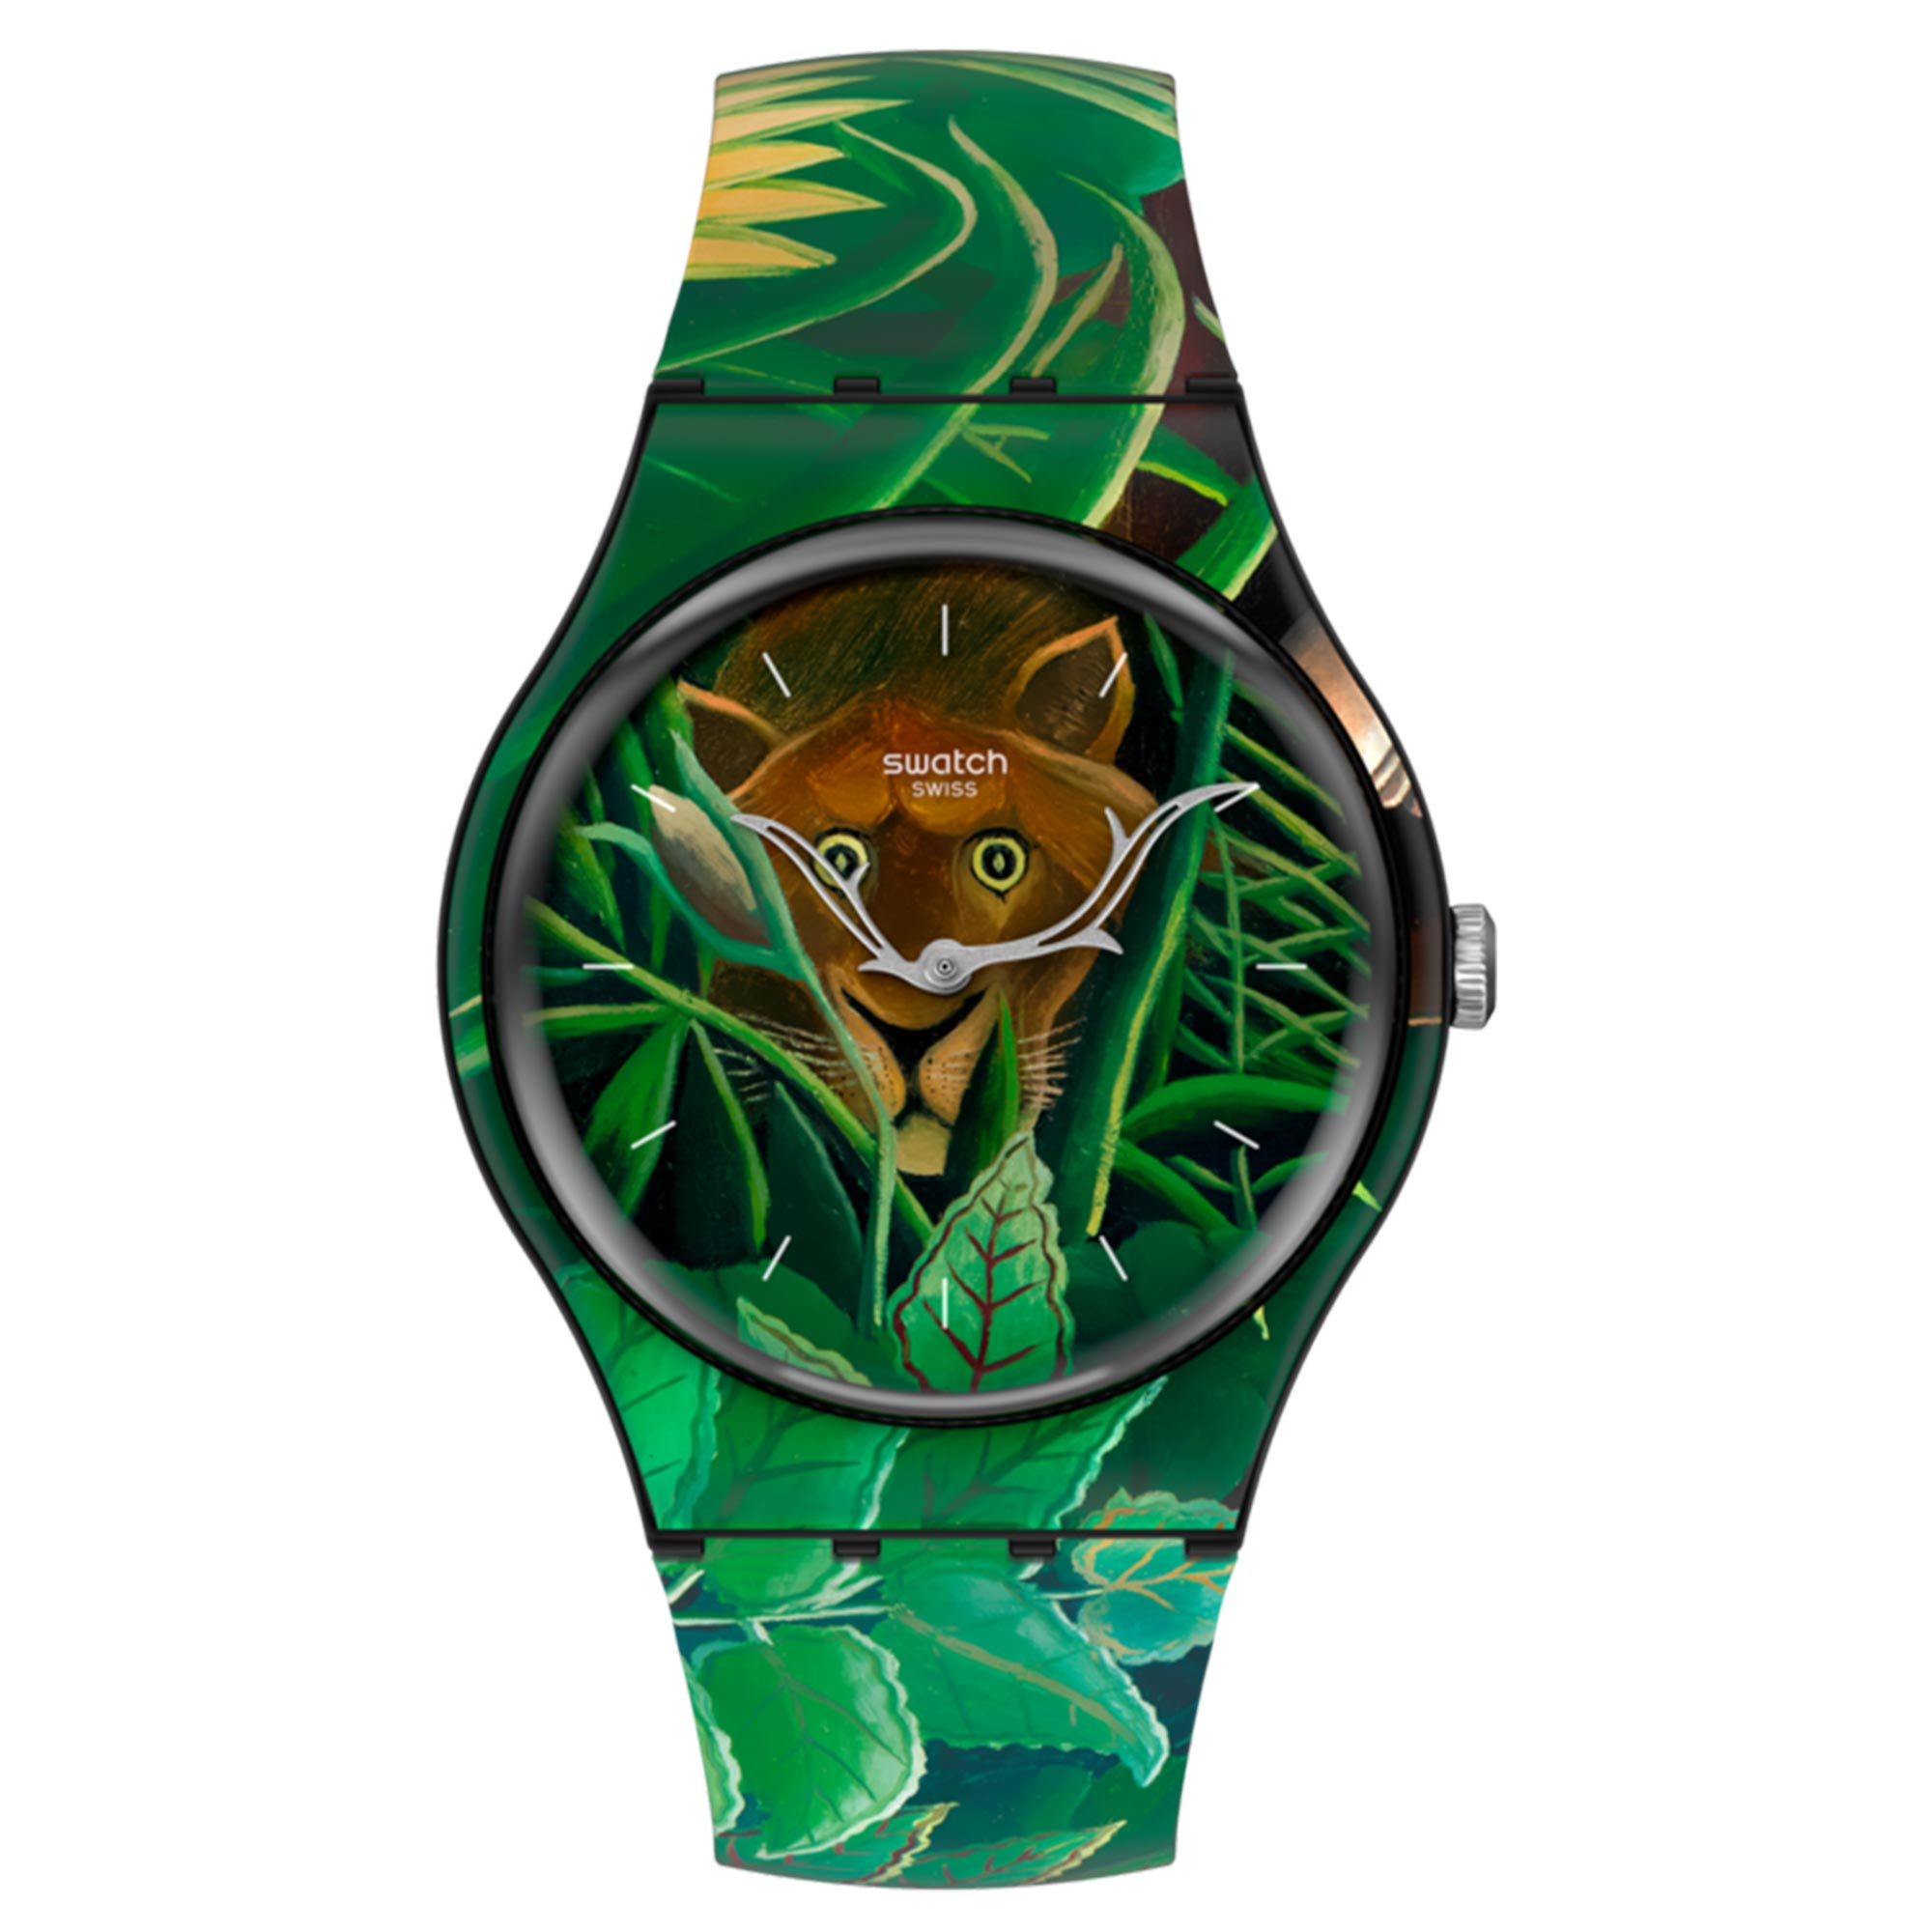 Swatch MoMA Quartz The Dream By Henri Rousseau, The Men's Watch SUOZ333